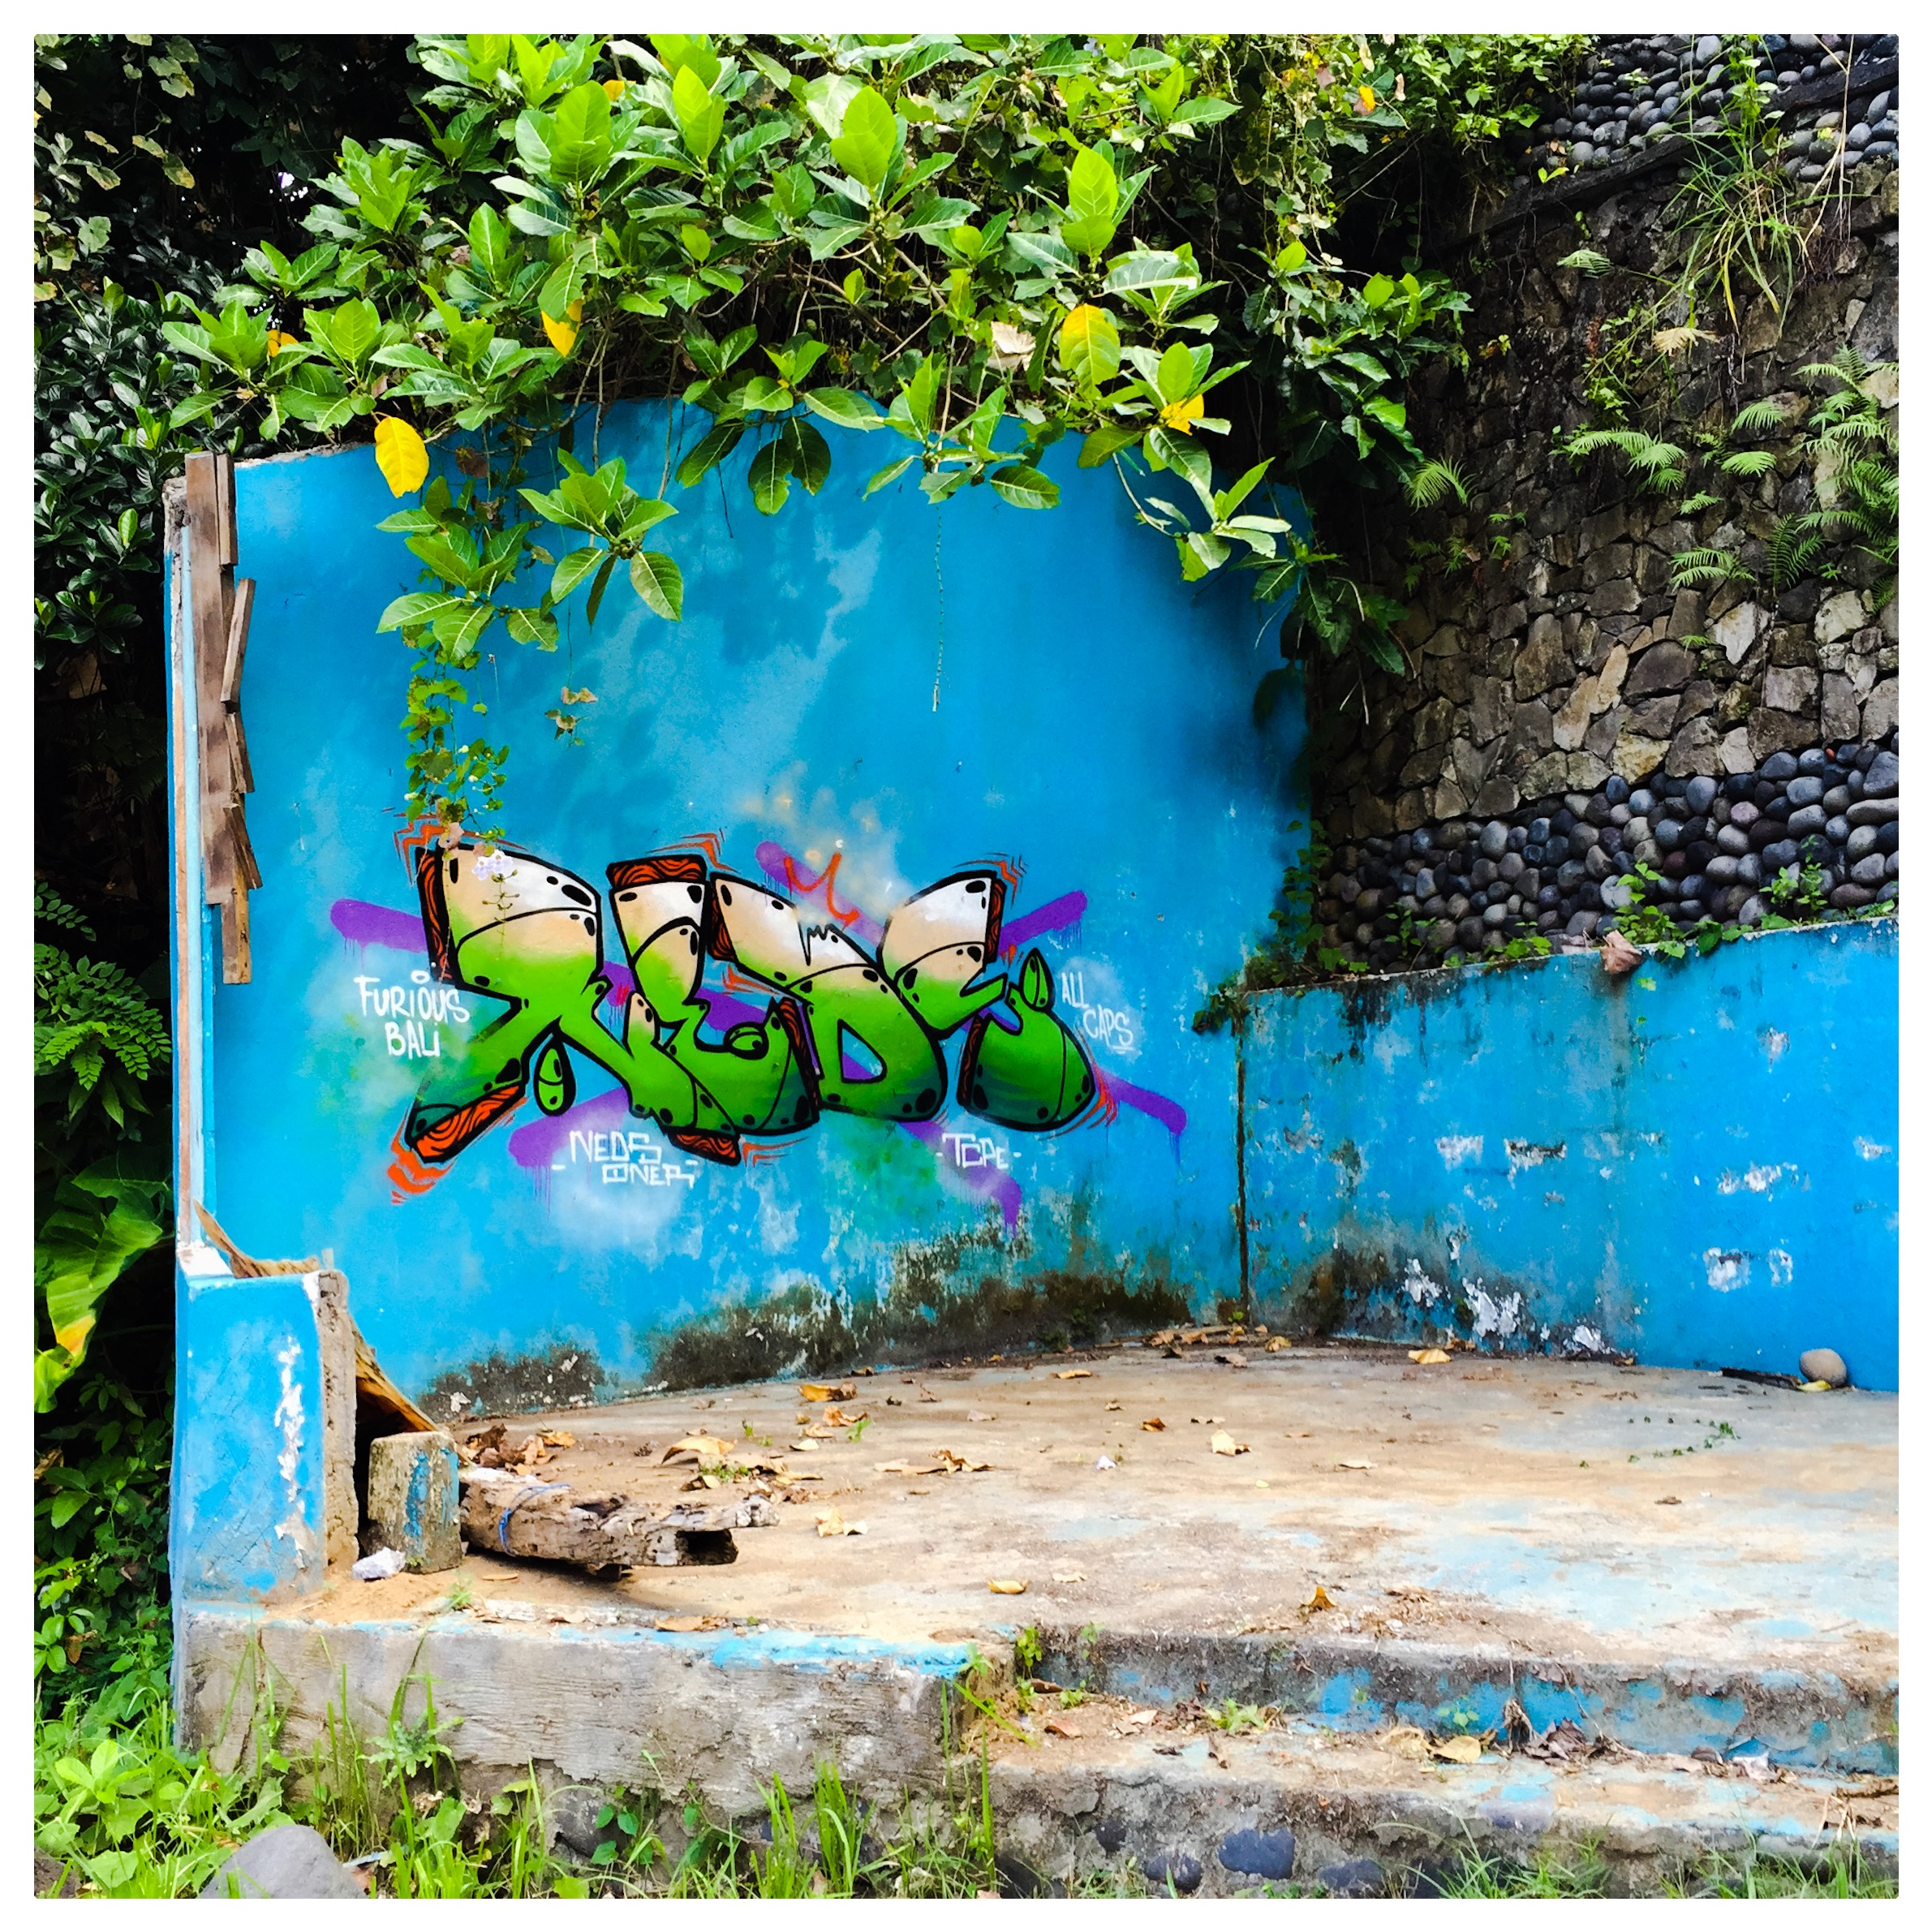 Street Art in Ubud